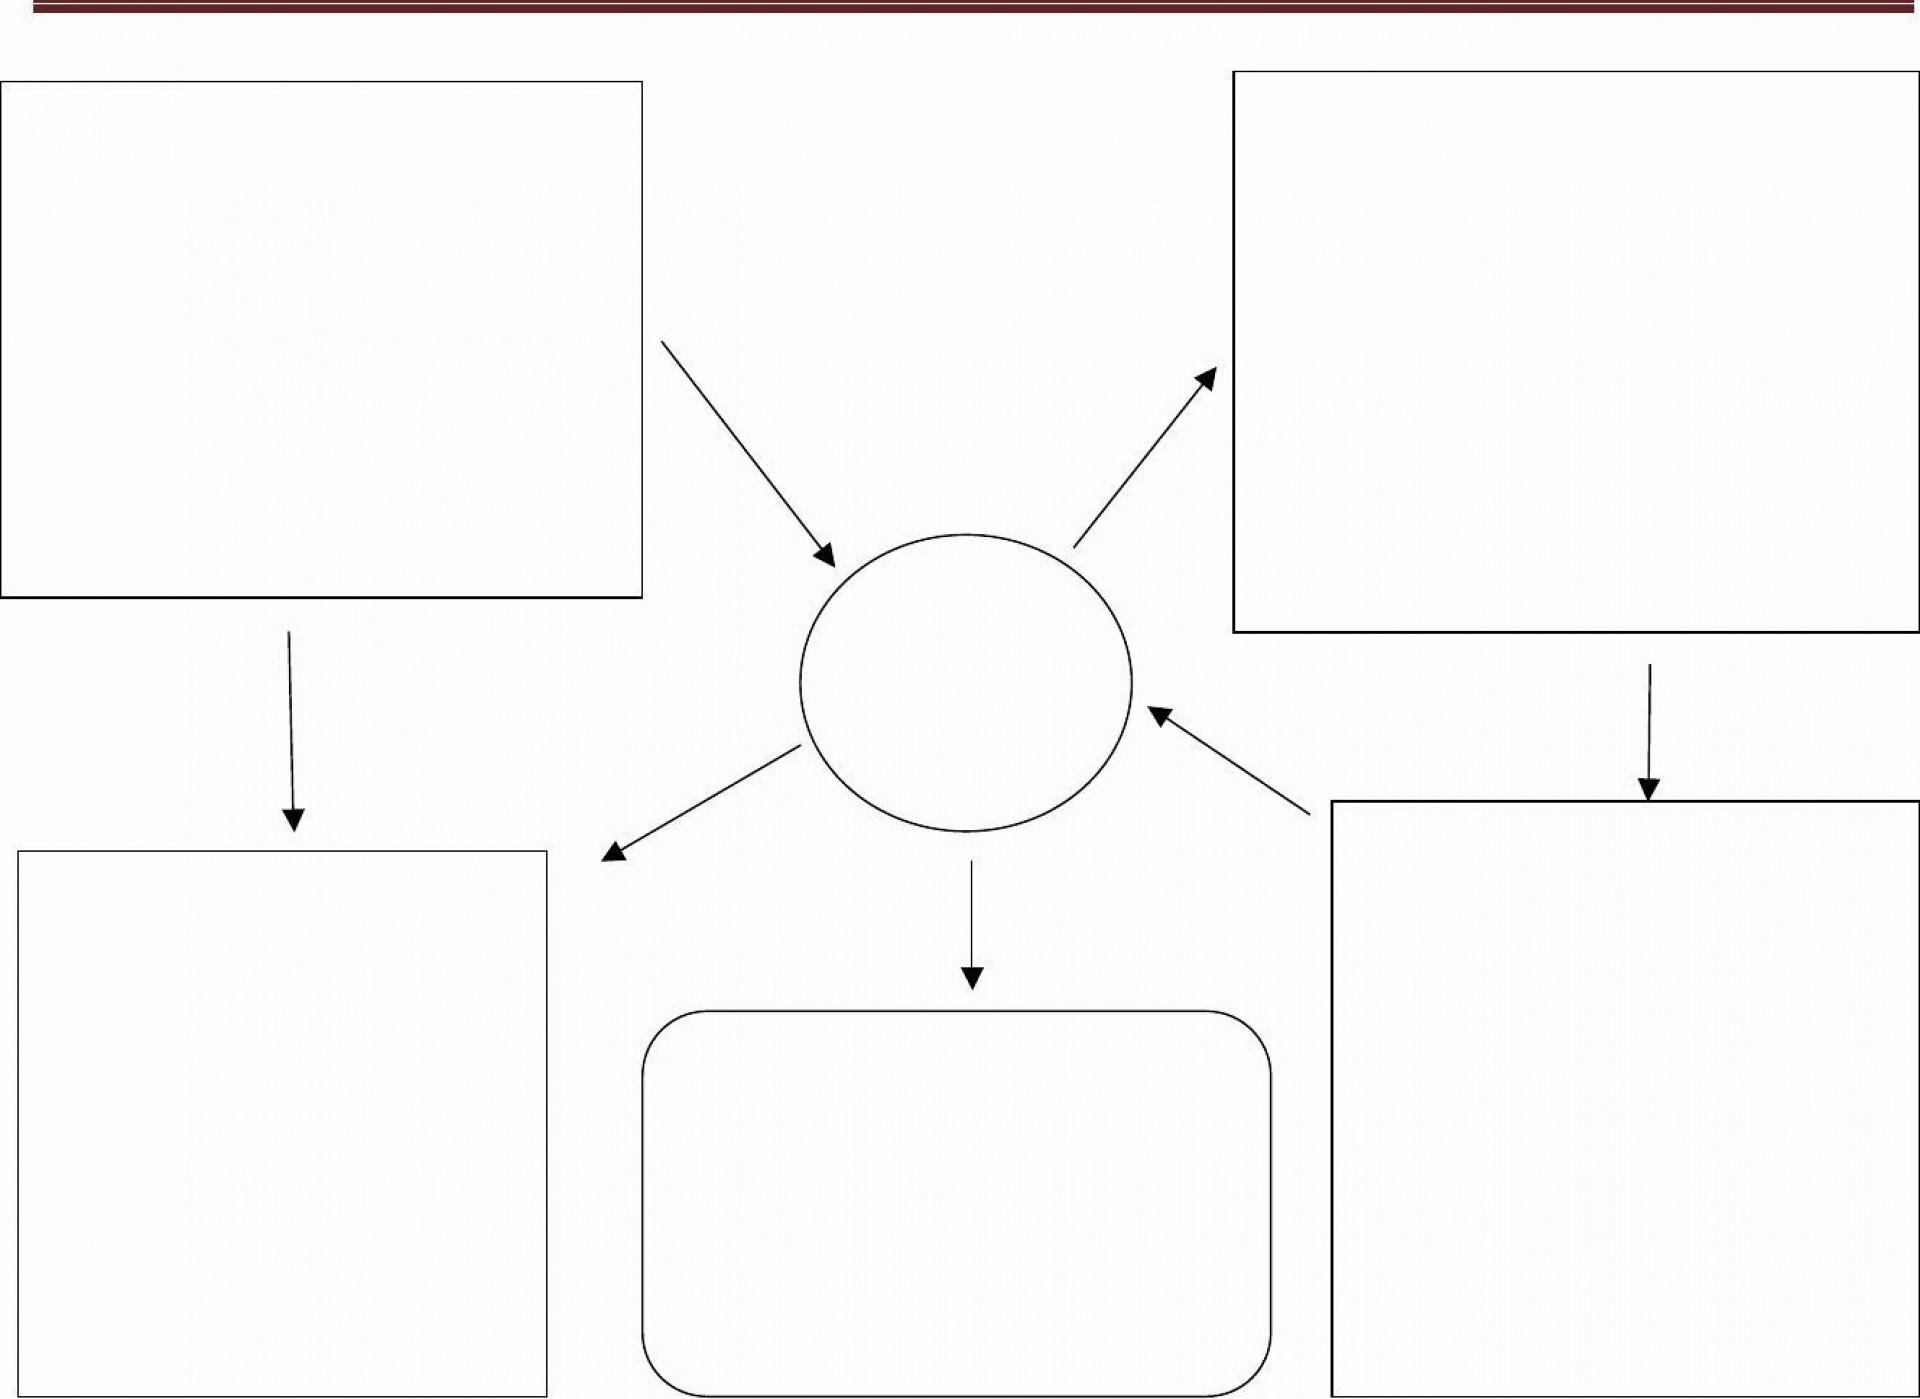 000 Wondrou Free Blank Concept Map Template Highest Clarity  Printable Nursing1920